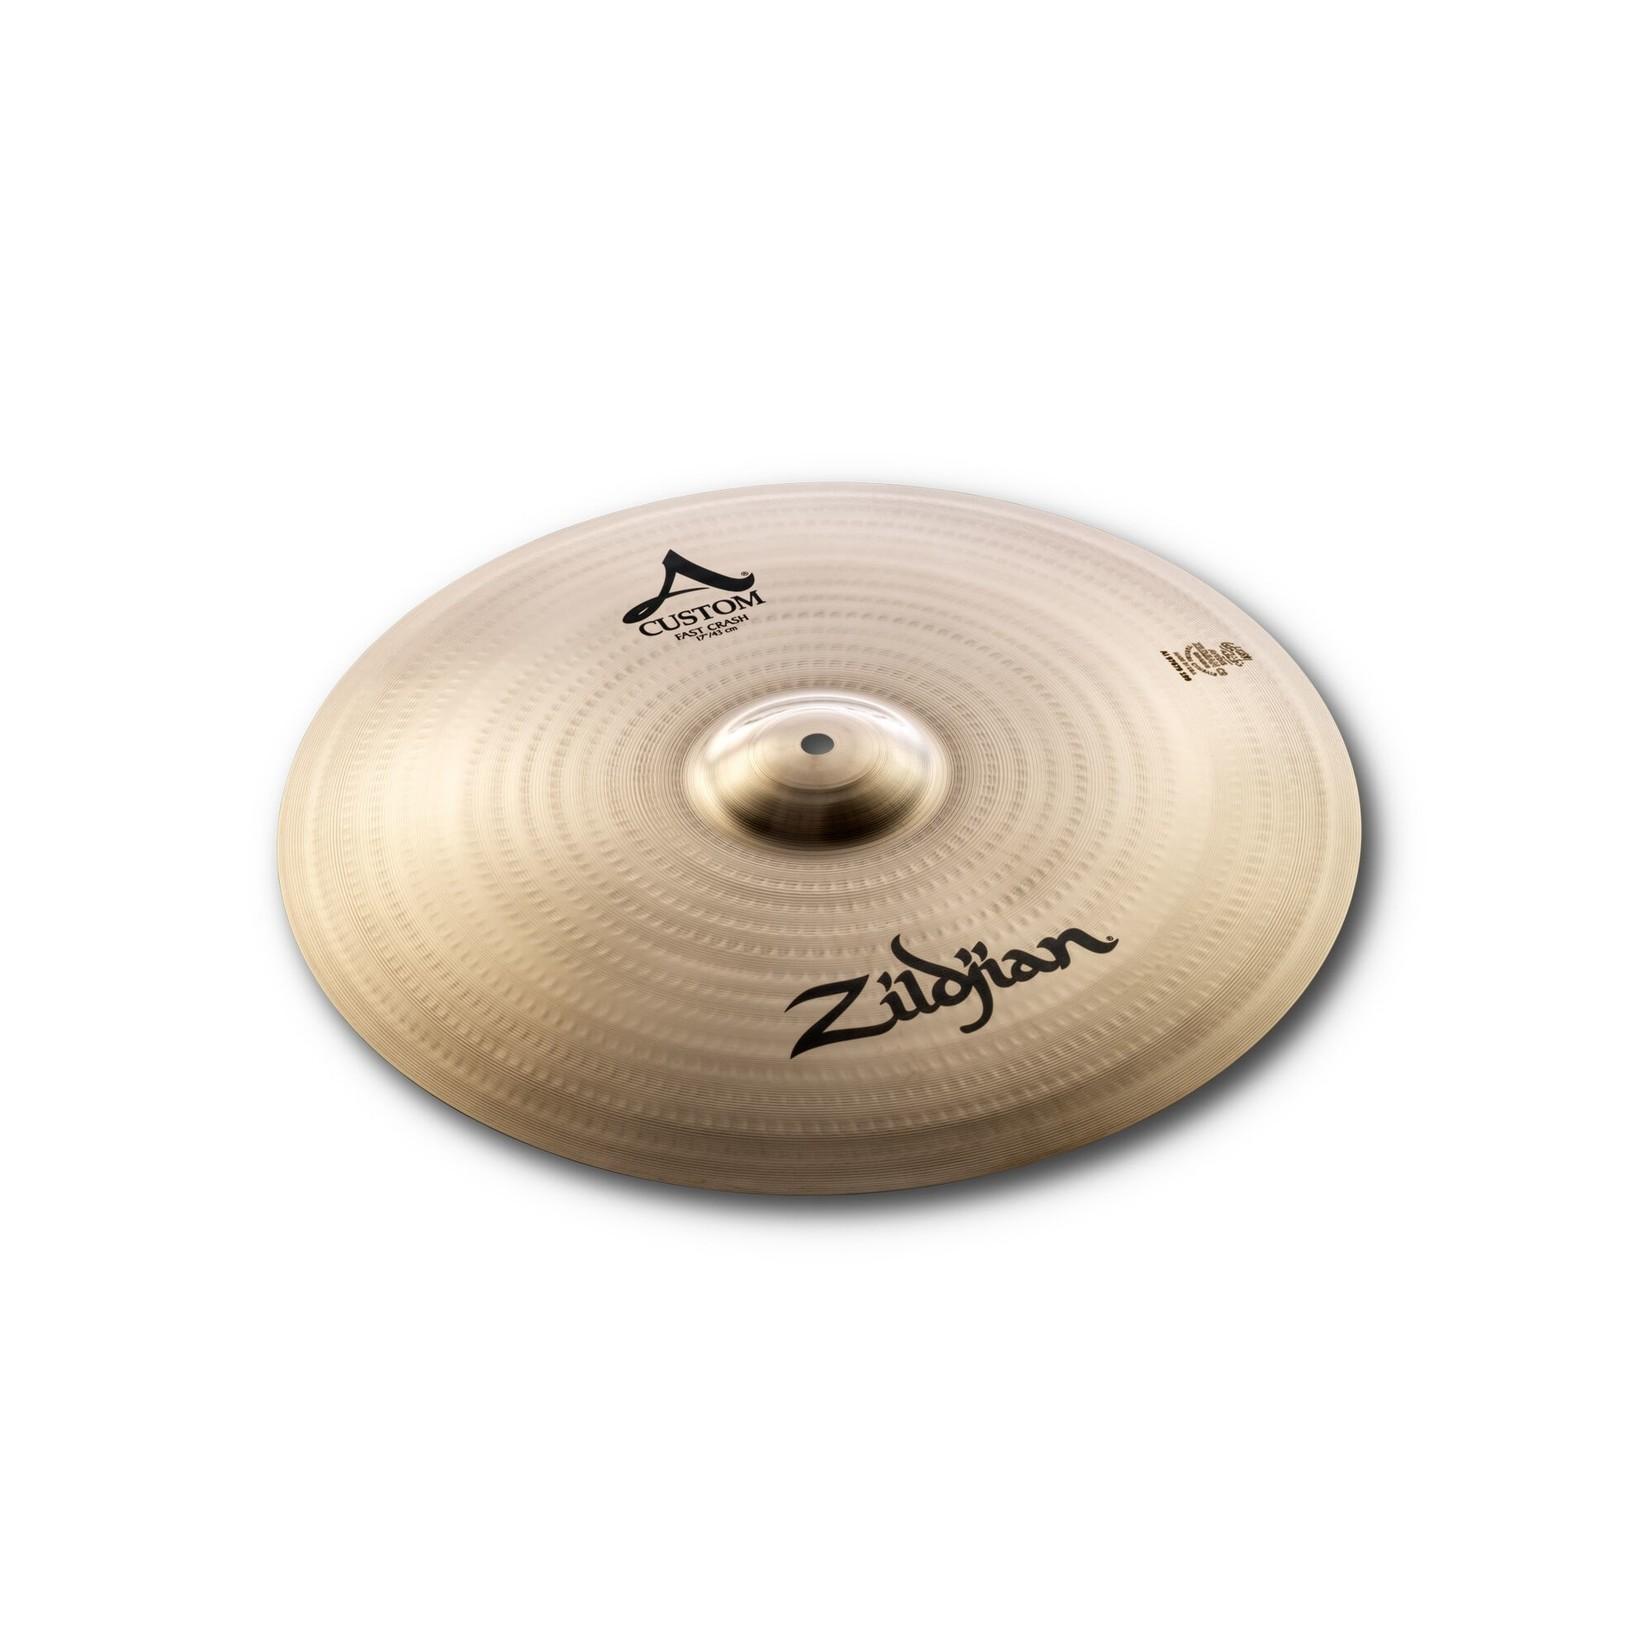 "Zildjian Zildjian 17"" A Custom Fast Crash"